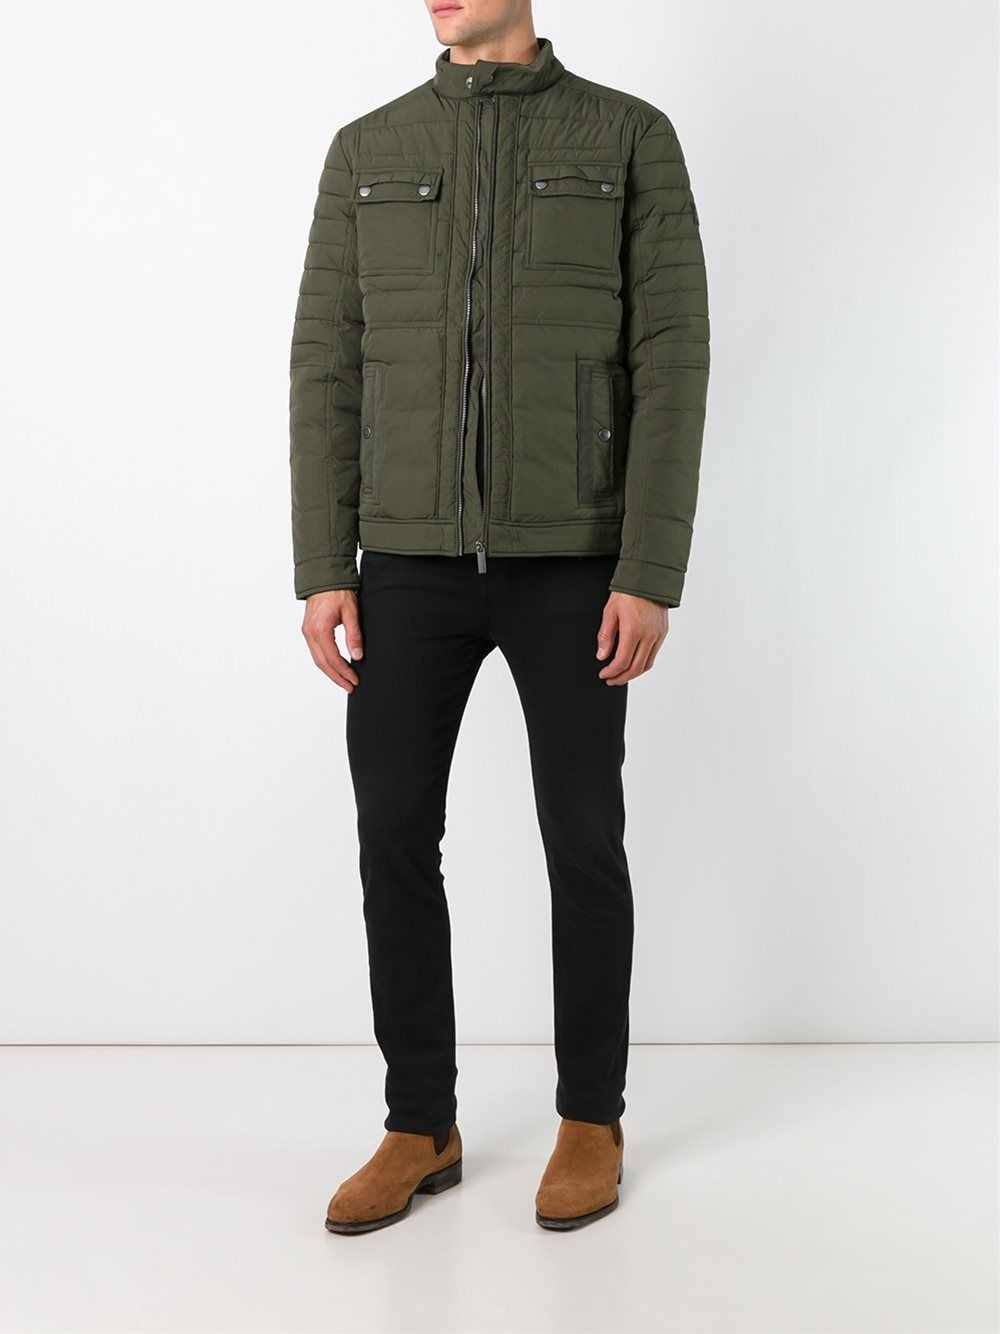 Calvin Klein Jeans Quilted Multi Pocket Jacket Jackets Mens Jackets Pocket Jacket [ 1334 x 1000 Pixel ]